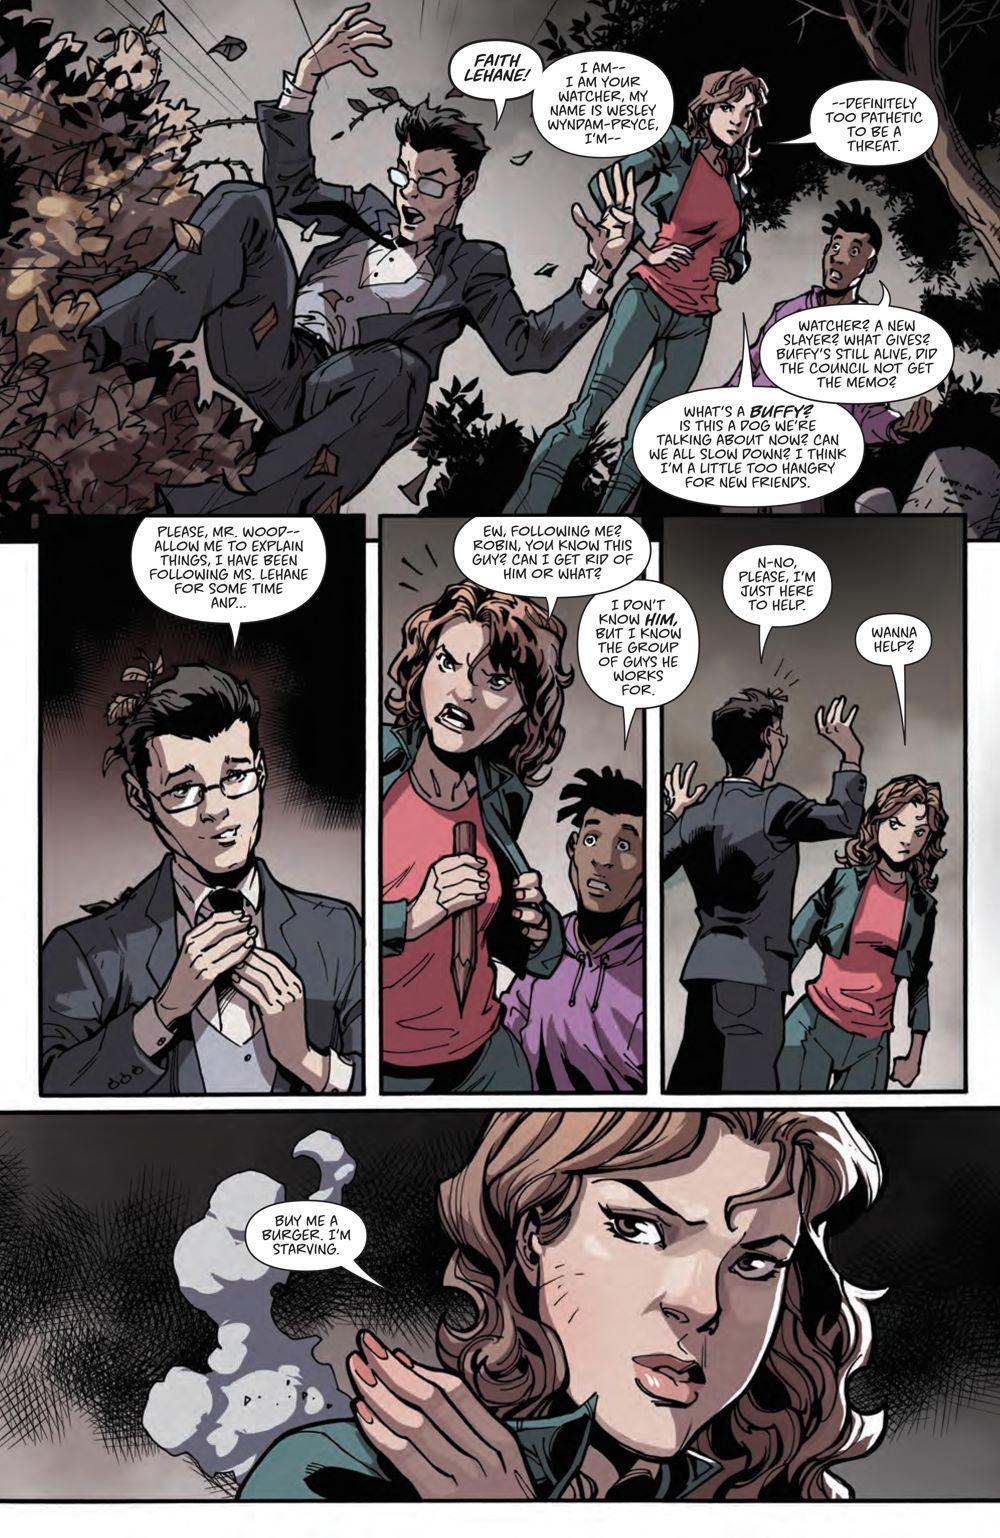 Buffy_020_PRESS_8 ComicList Previews: BUFFY THE VAMPIRE SLAYER #20